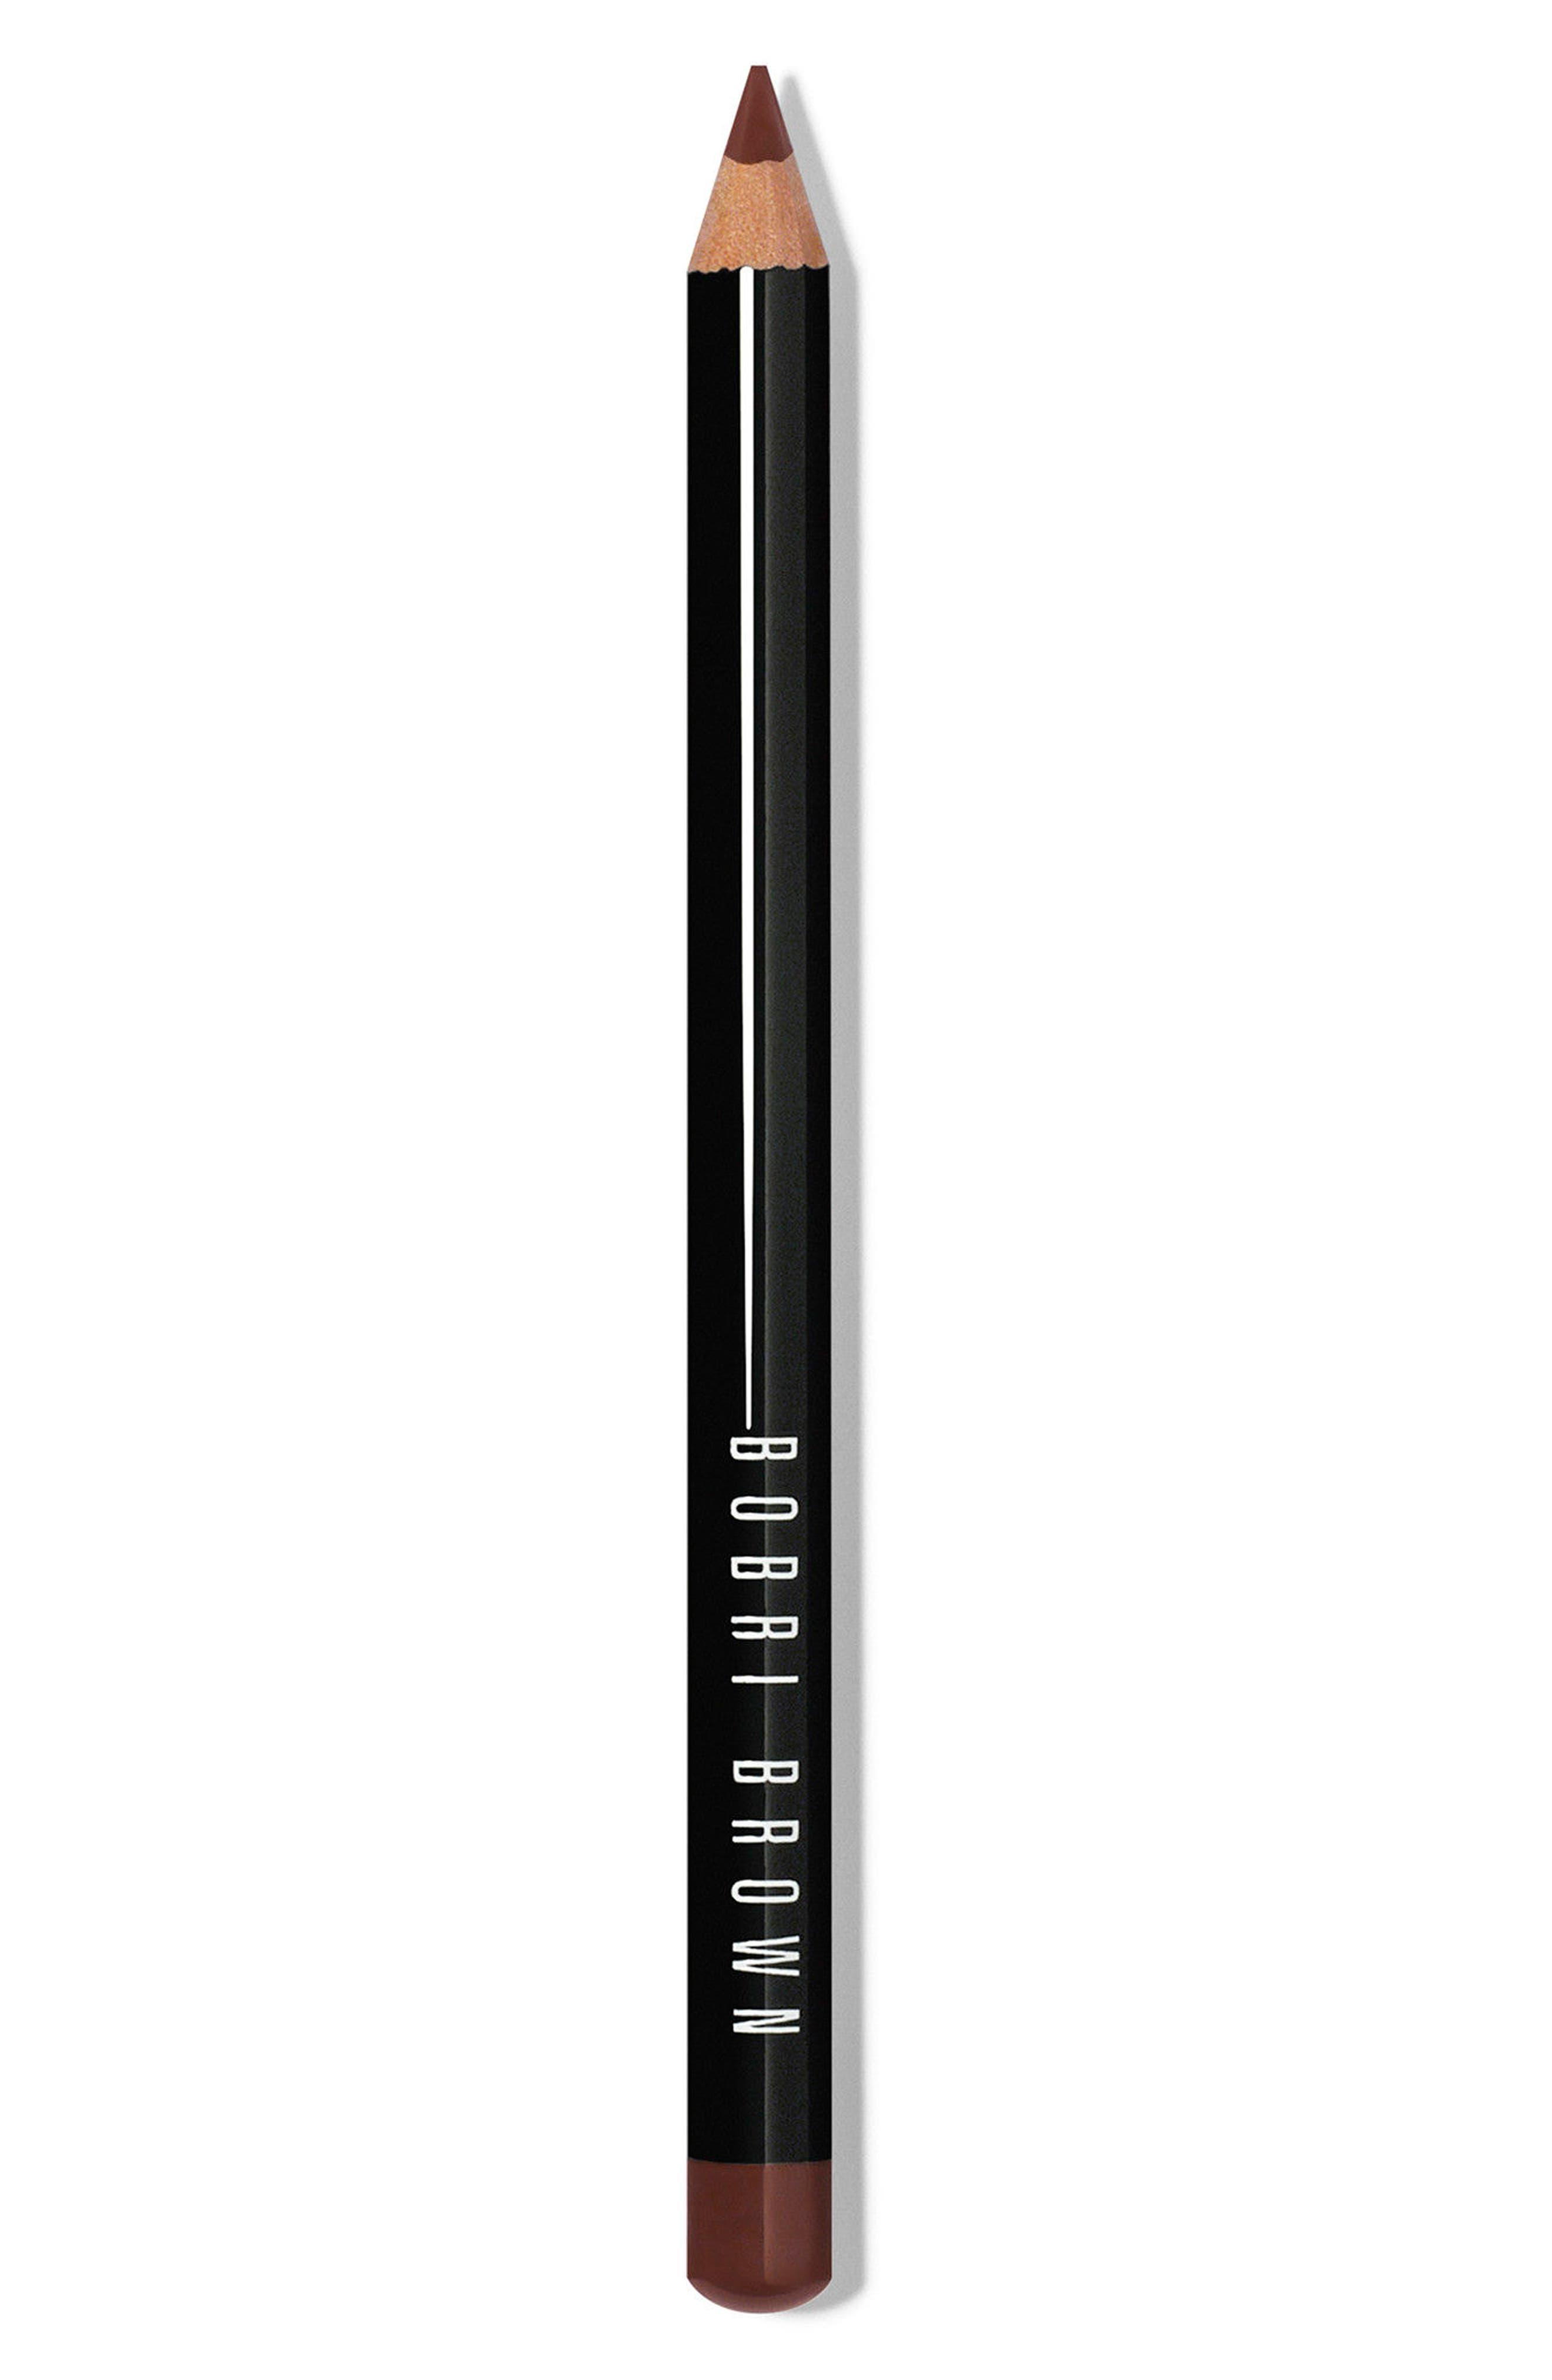 BOBBI BROWN, Lip Liner Pencil, Main thumbnail 1, color, CHOCOLATE